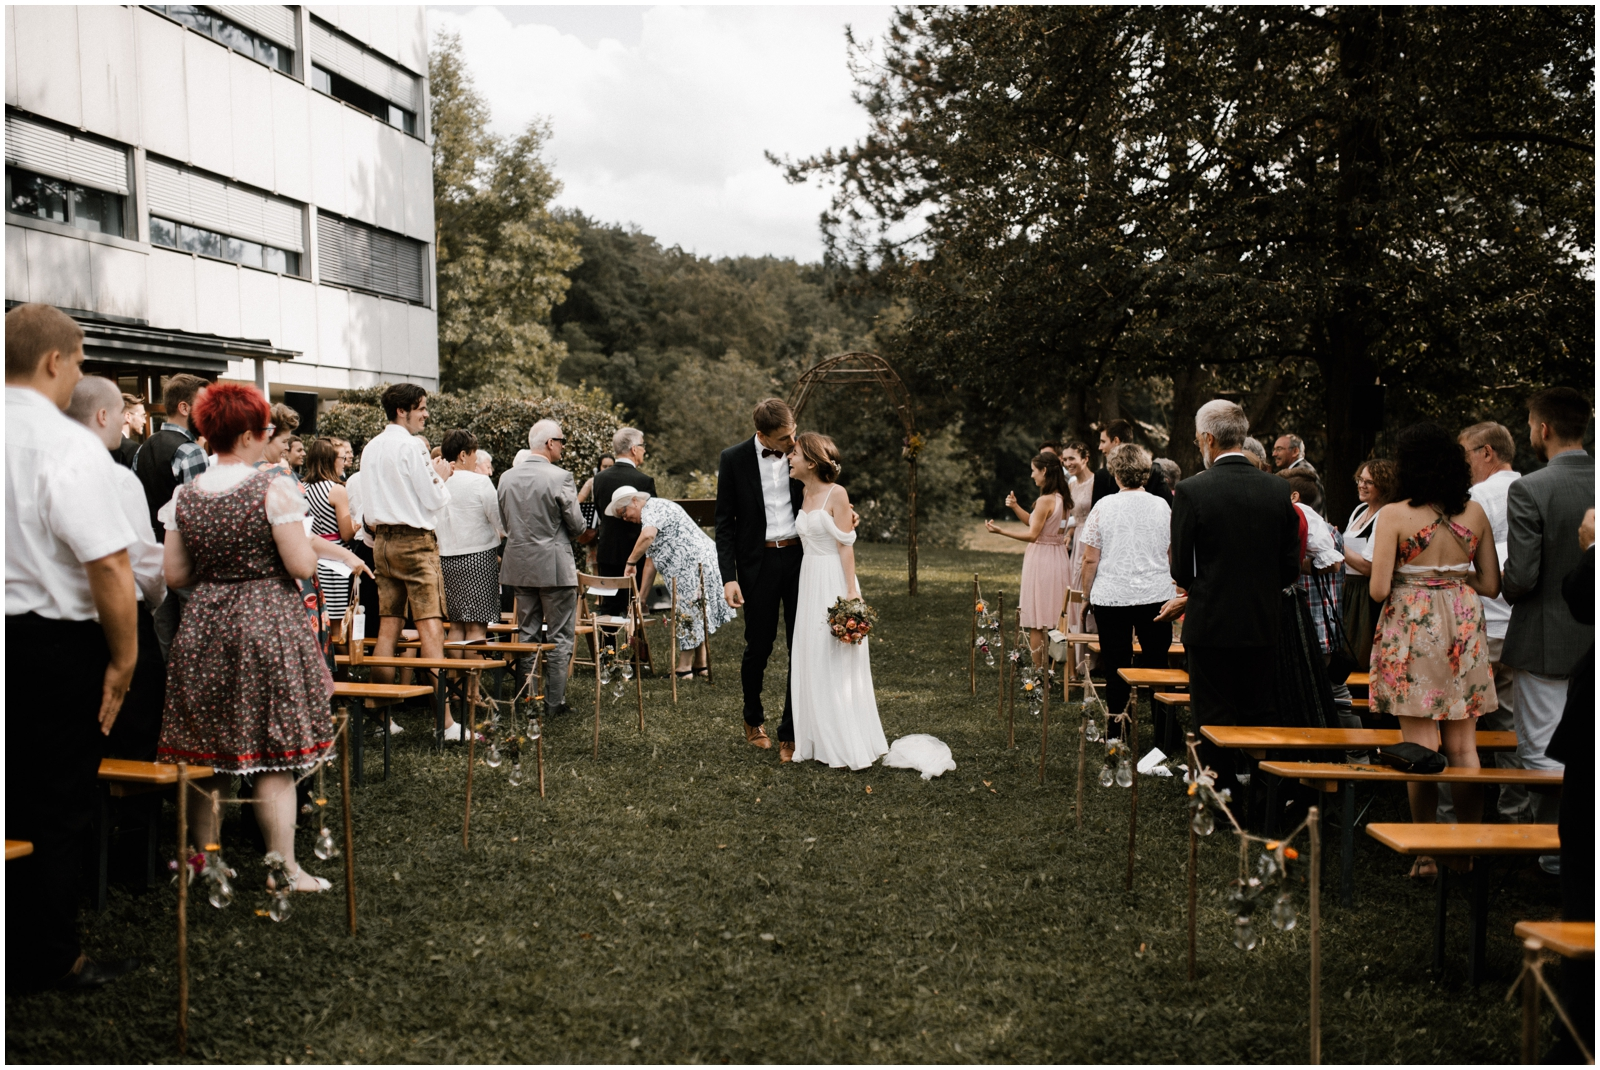 mirjam_thomas_wedding-447.jpg